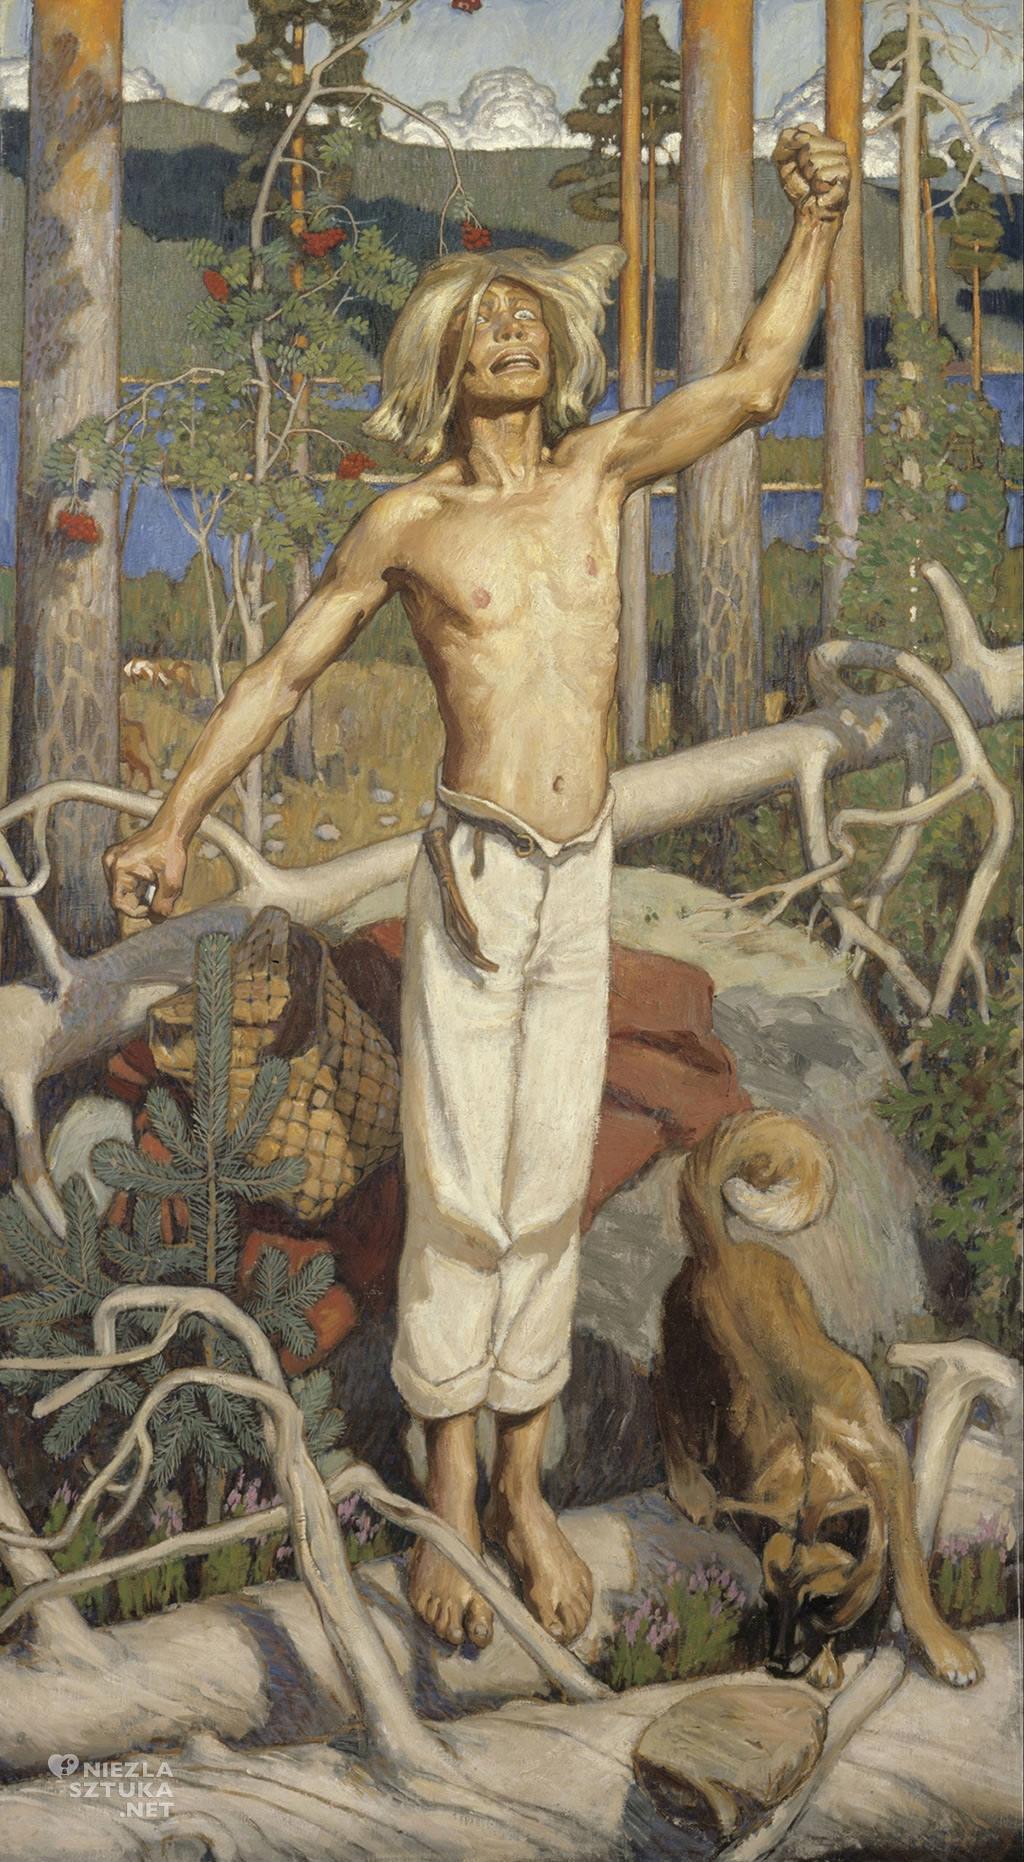 Akseli Gallen-Kallela, Przeklinający Kullervo, sztuka fińska, sztuak europejska, malarstwo, Niezła Sztuka